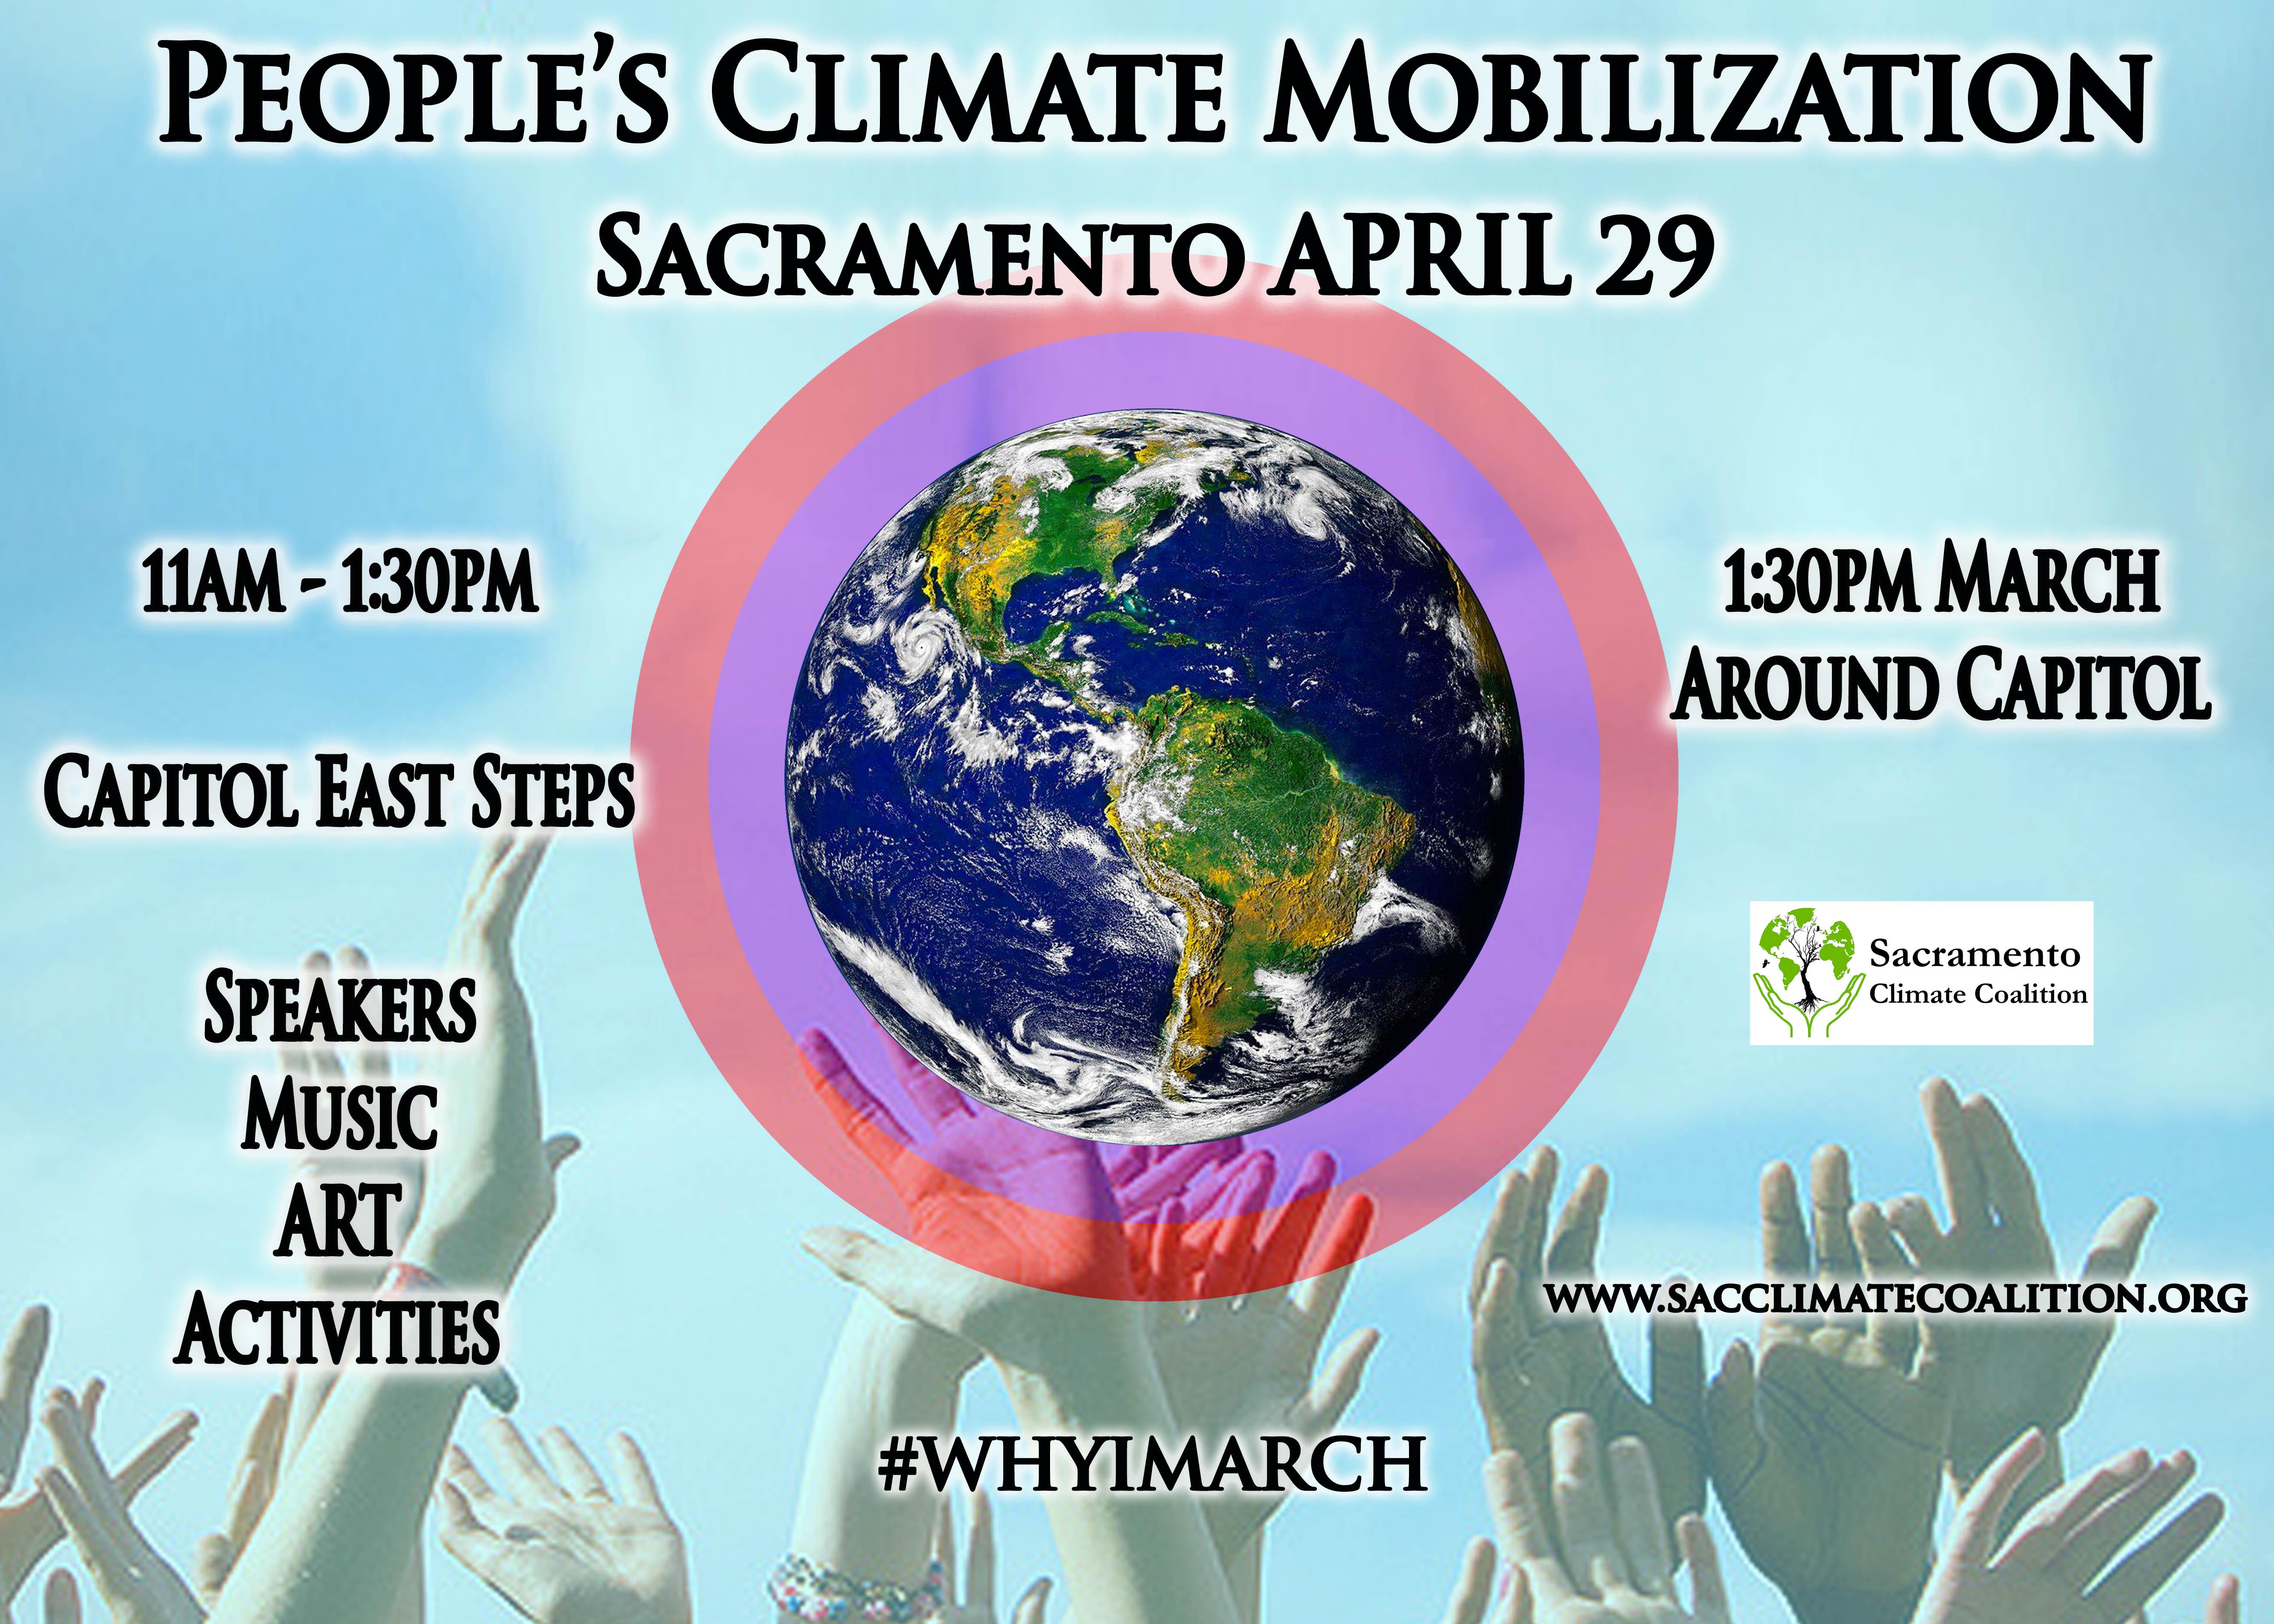 People's Climate Mobilization Sacramento